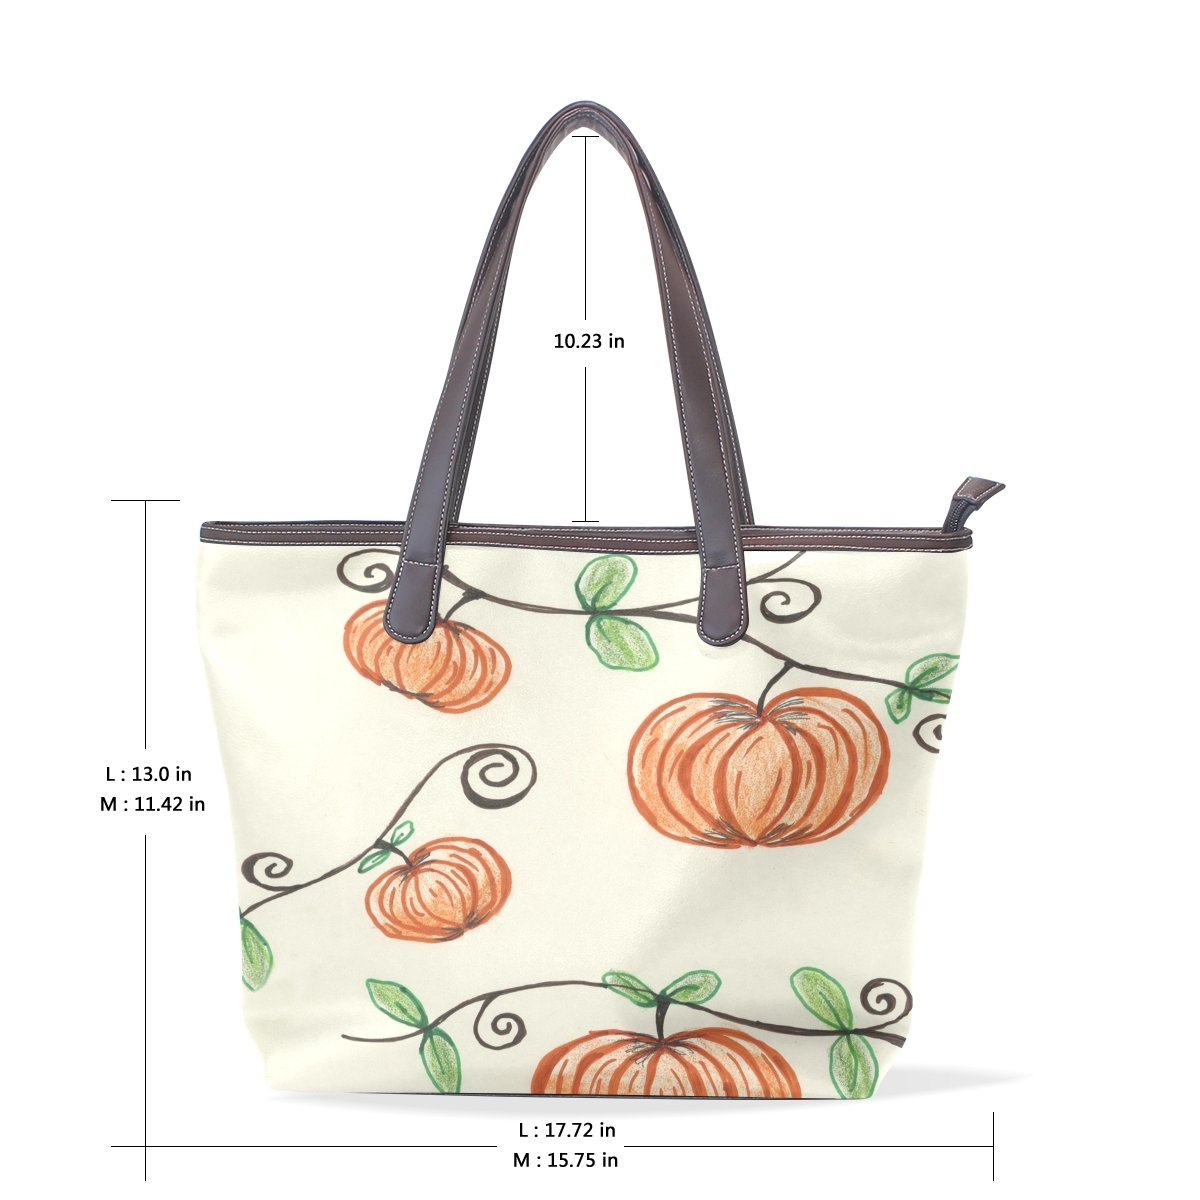 Ye Store Four Pumpkins Lady PU Leather Handbag Tote Bag Shoulder Bag Shopping Bag